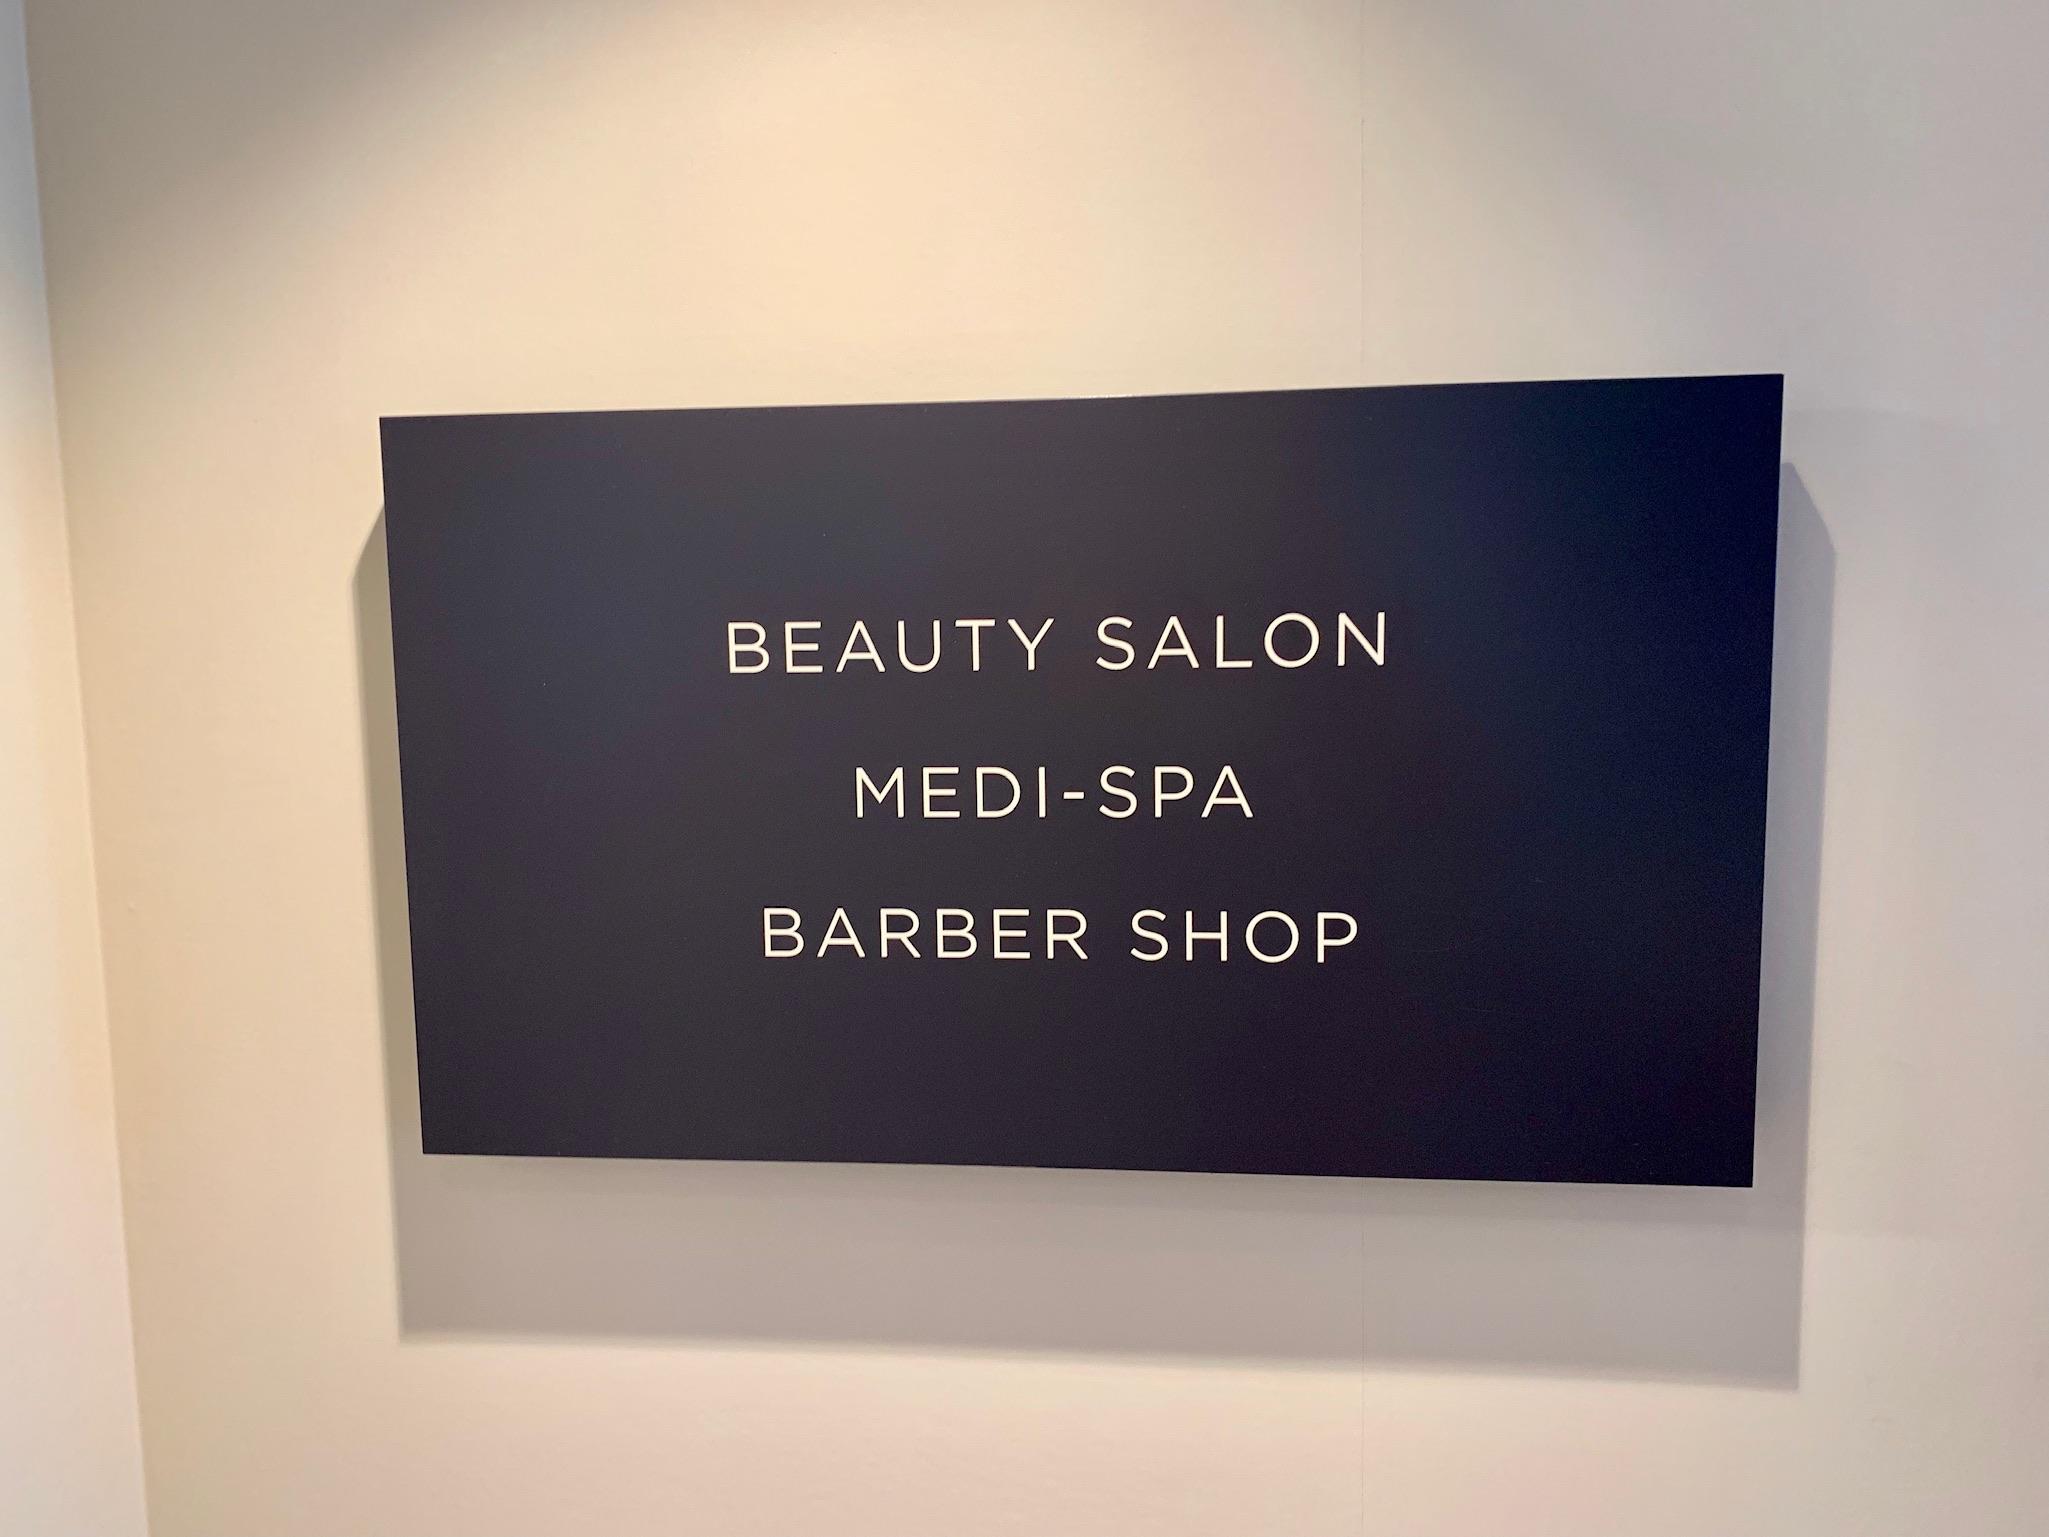 NCL Joy Salon Barber Shop